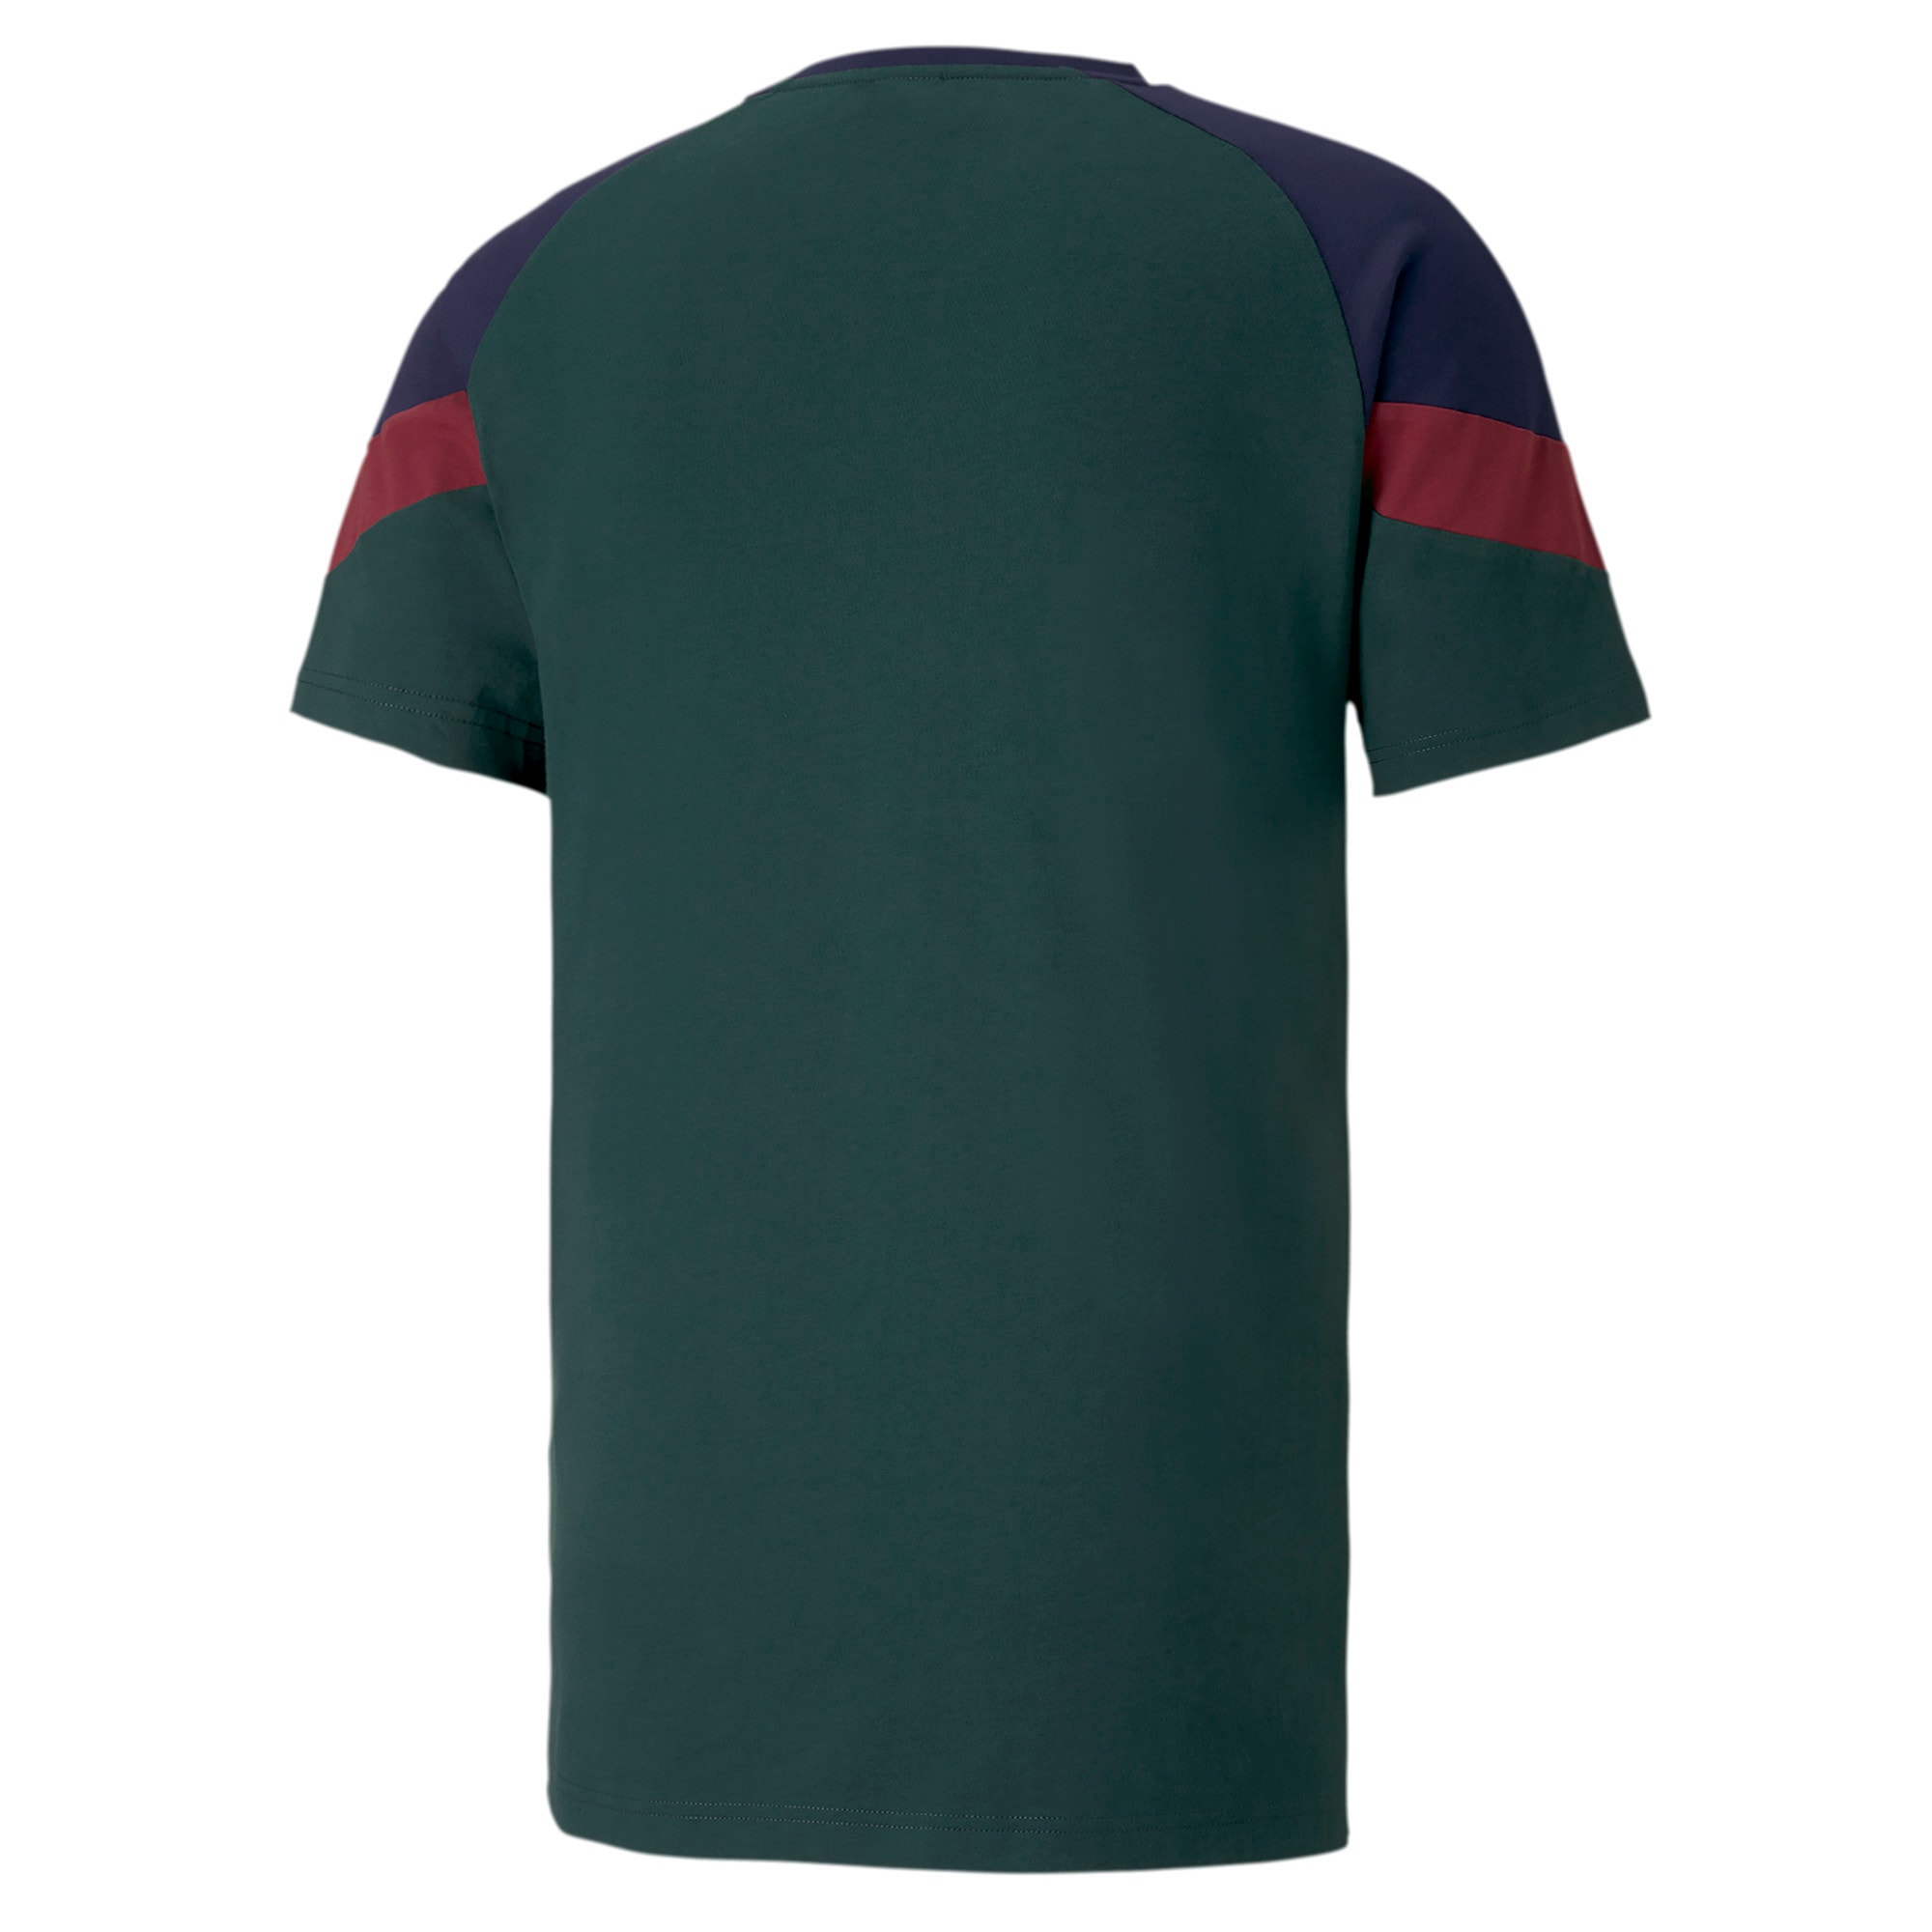 Thumbnail 2 of Italia Iconic MCS Herren T-Shirt, Ponderosa Pine-peacoat, medium